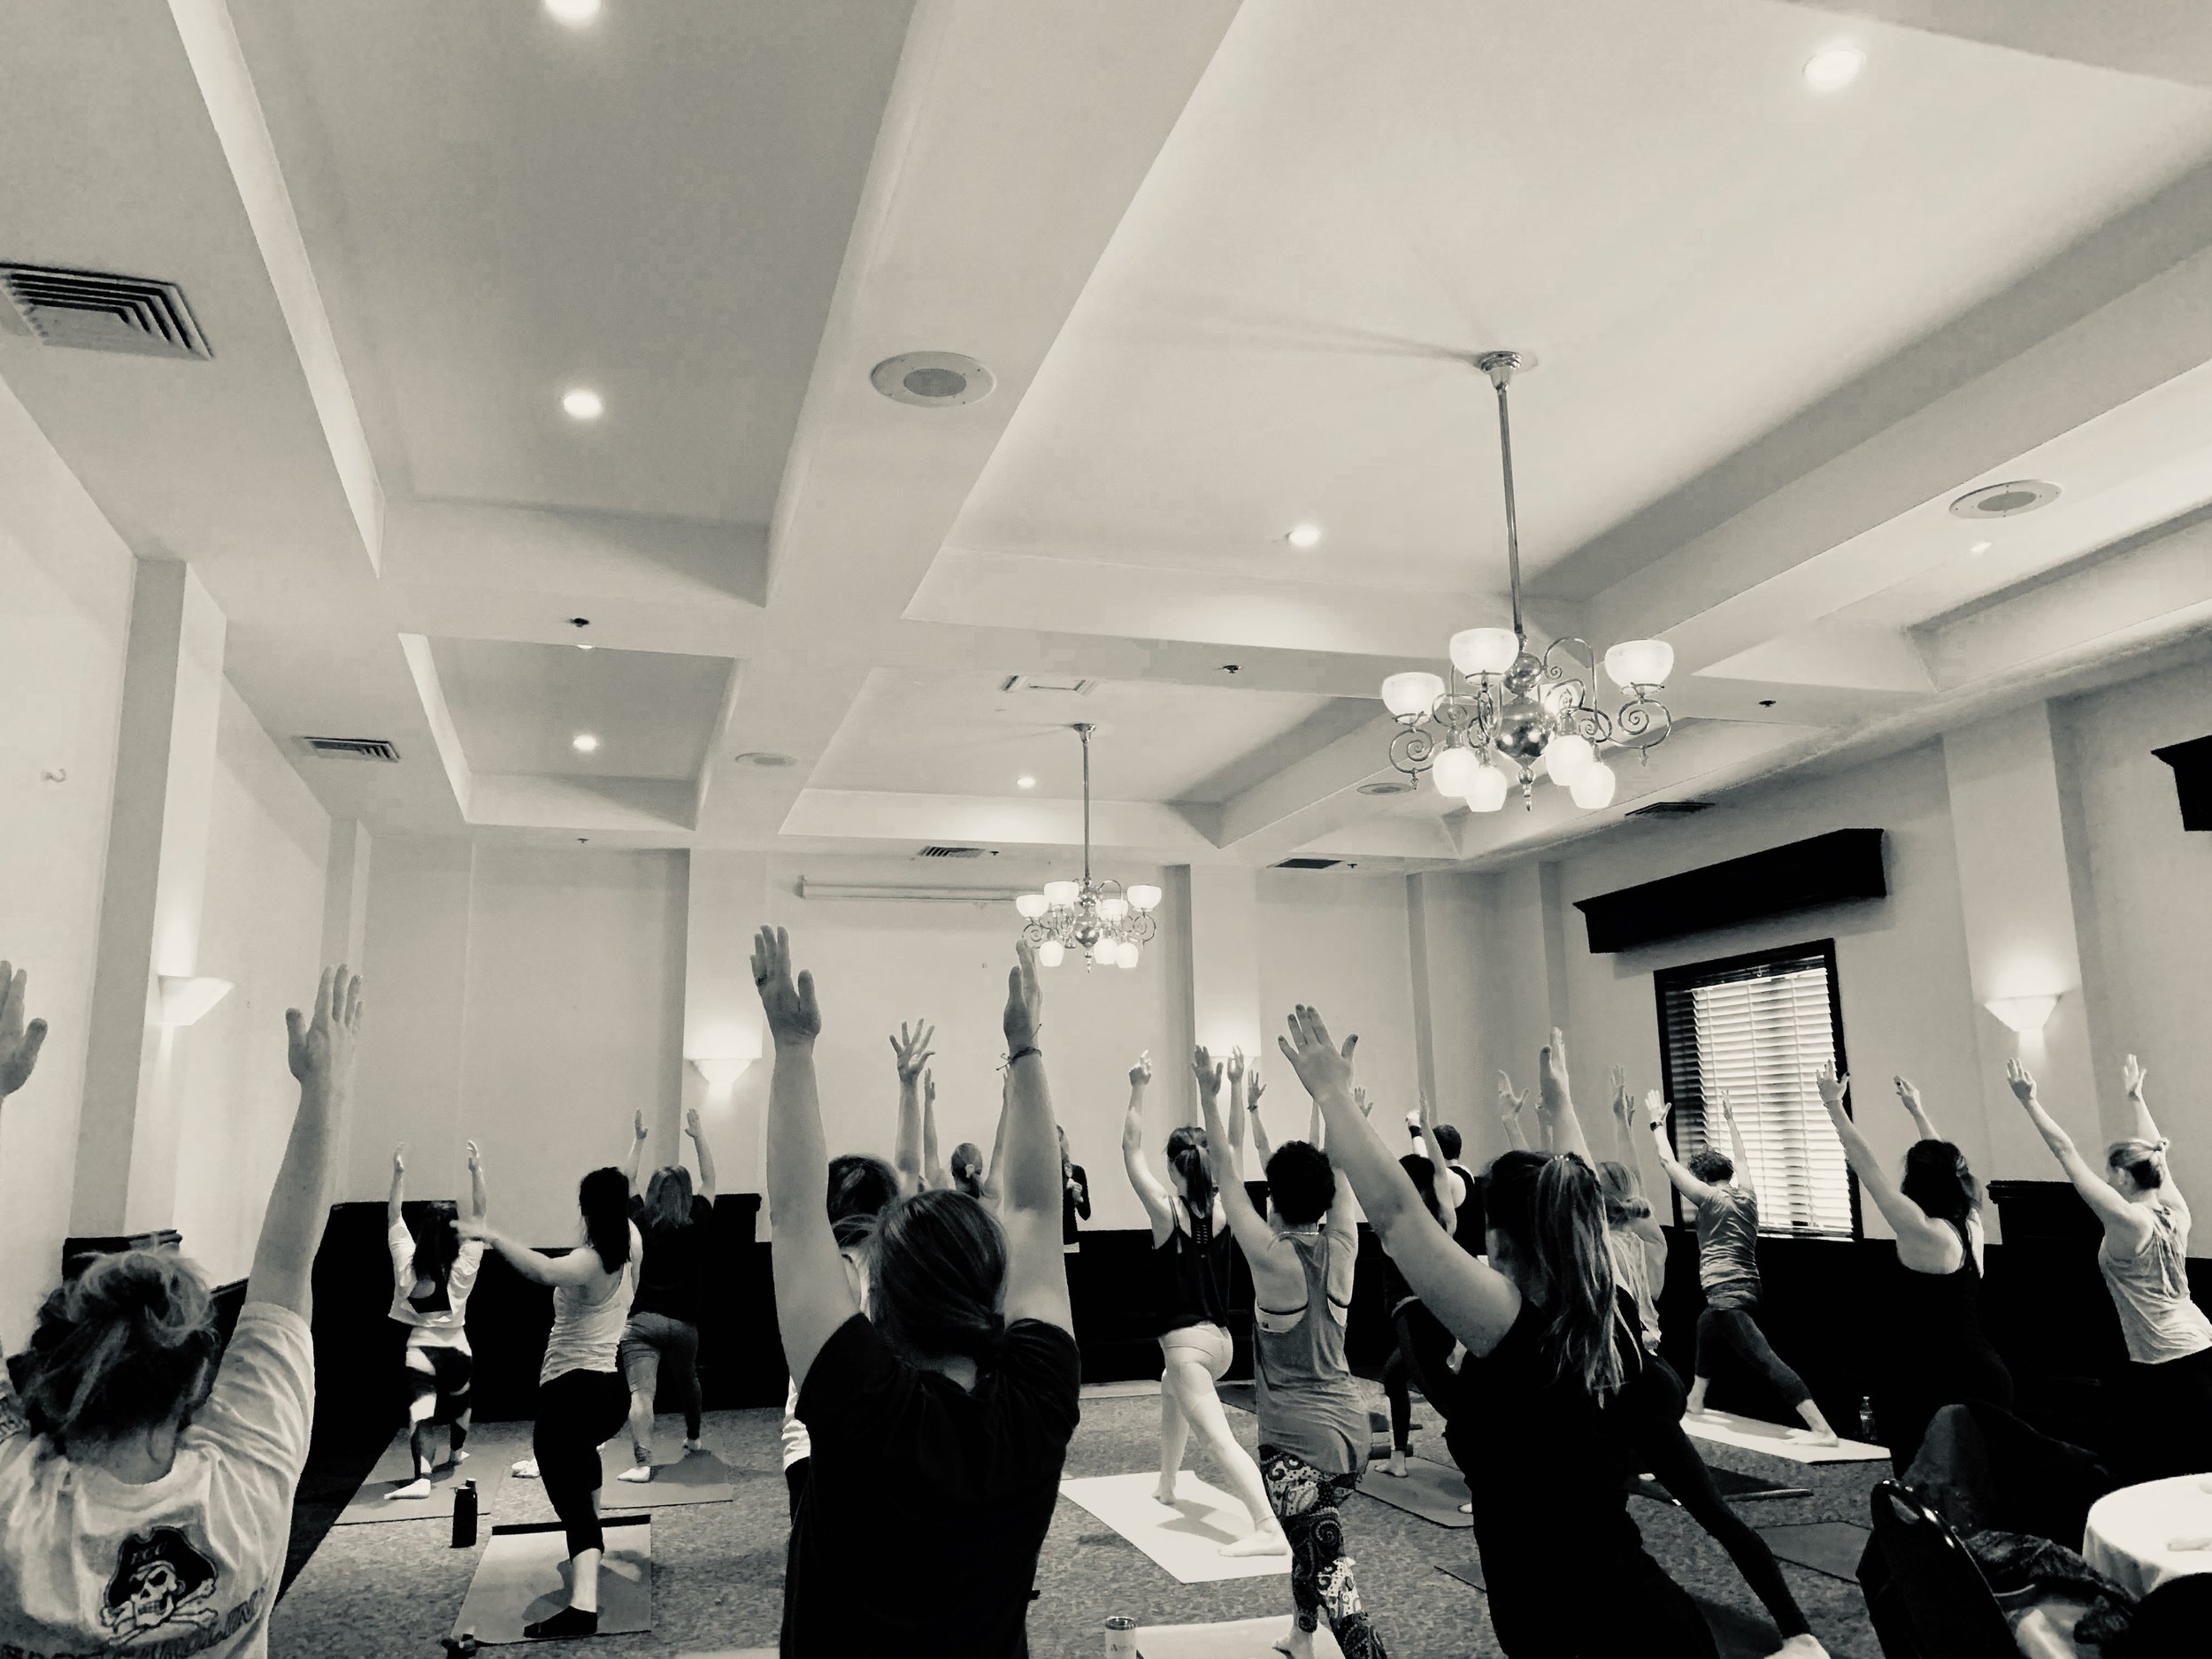 macsonthemove.yoga.brunch.event.bw.jpeg